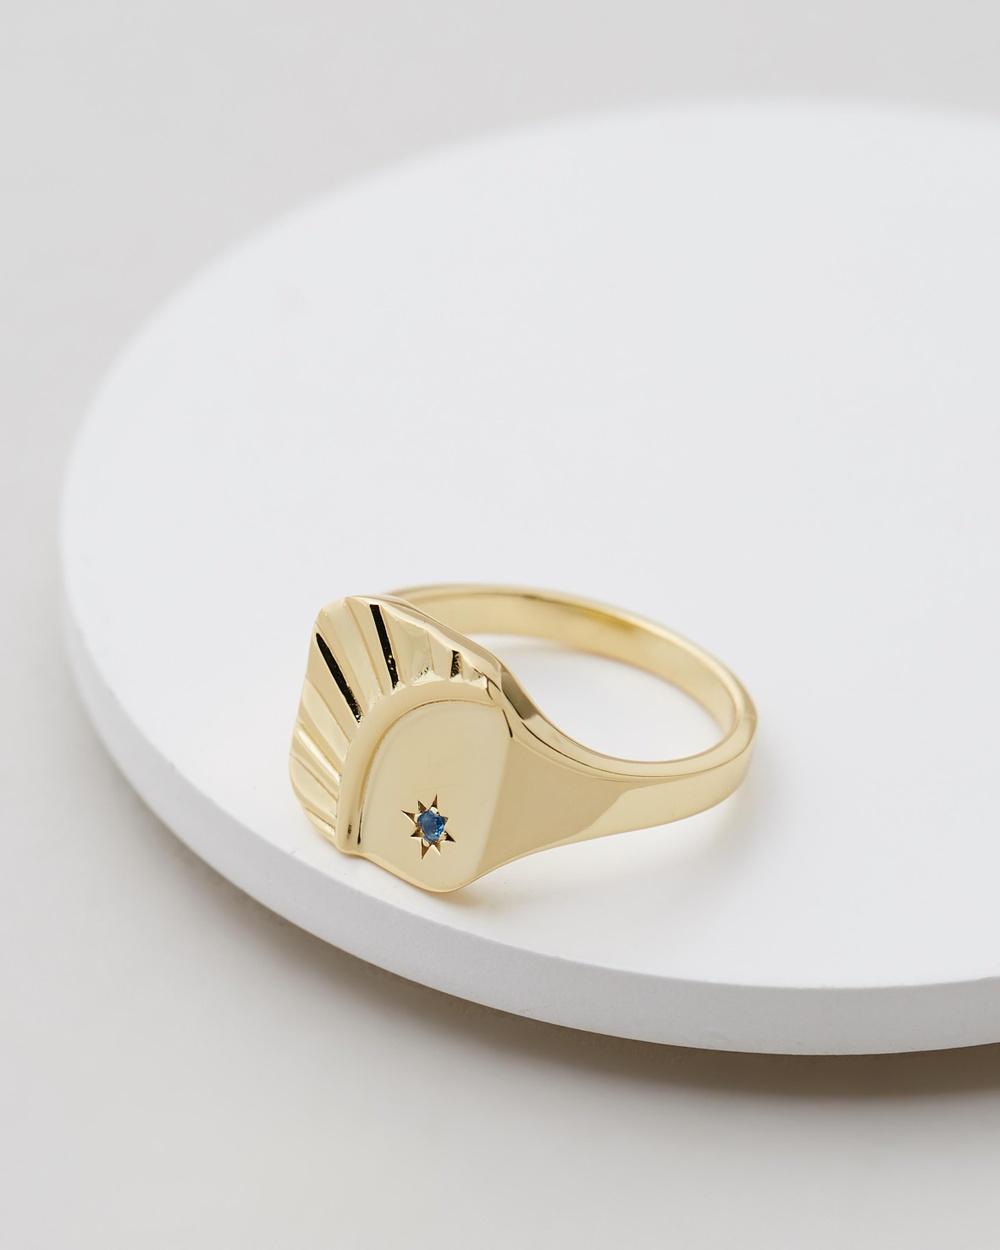 Serge DeNimes Blue Moon Ring Jewellery Gold